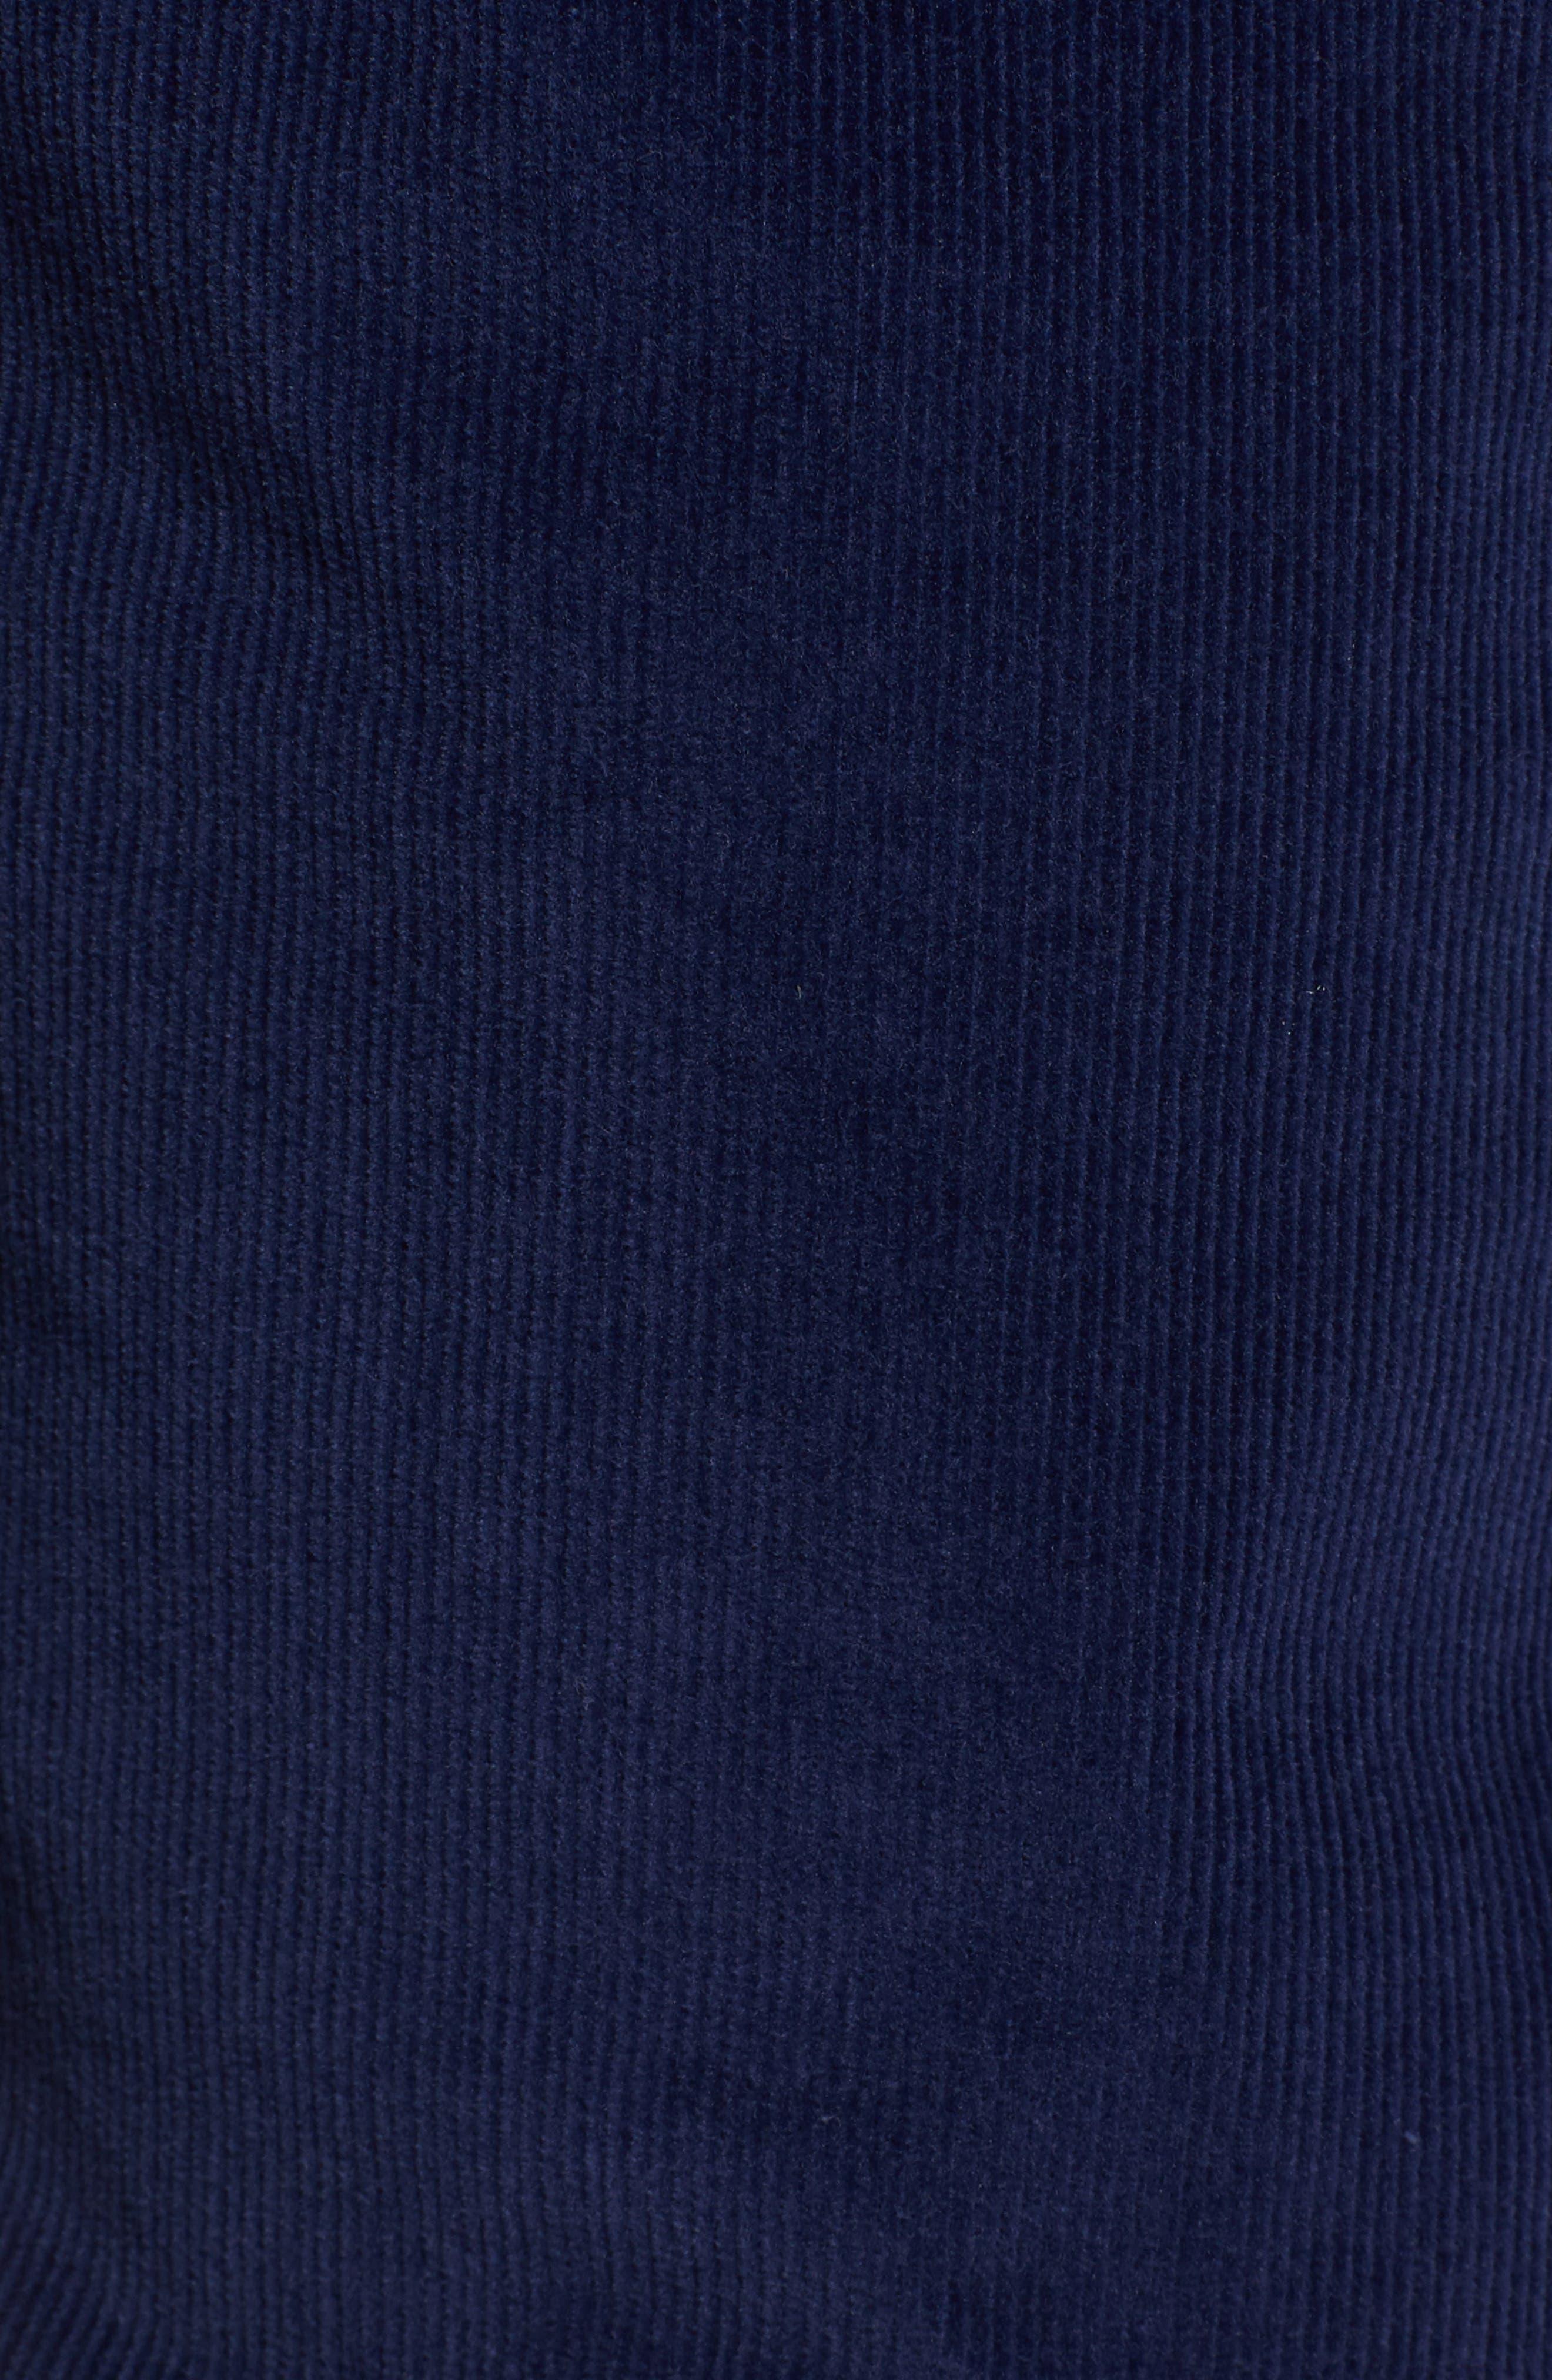 Slim Fit Corduroy Jeans,                             Alternate thumbnail 5, color,                             MIDNIGHT